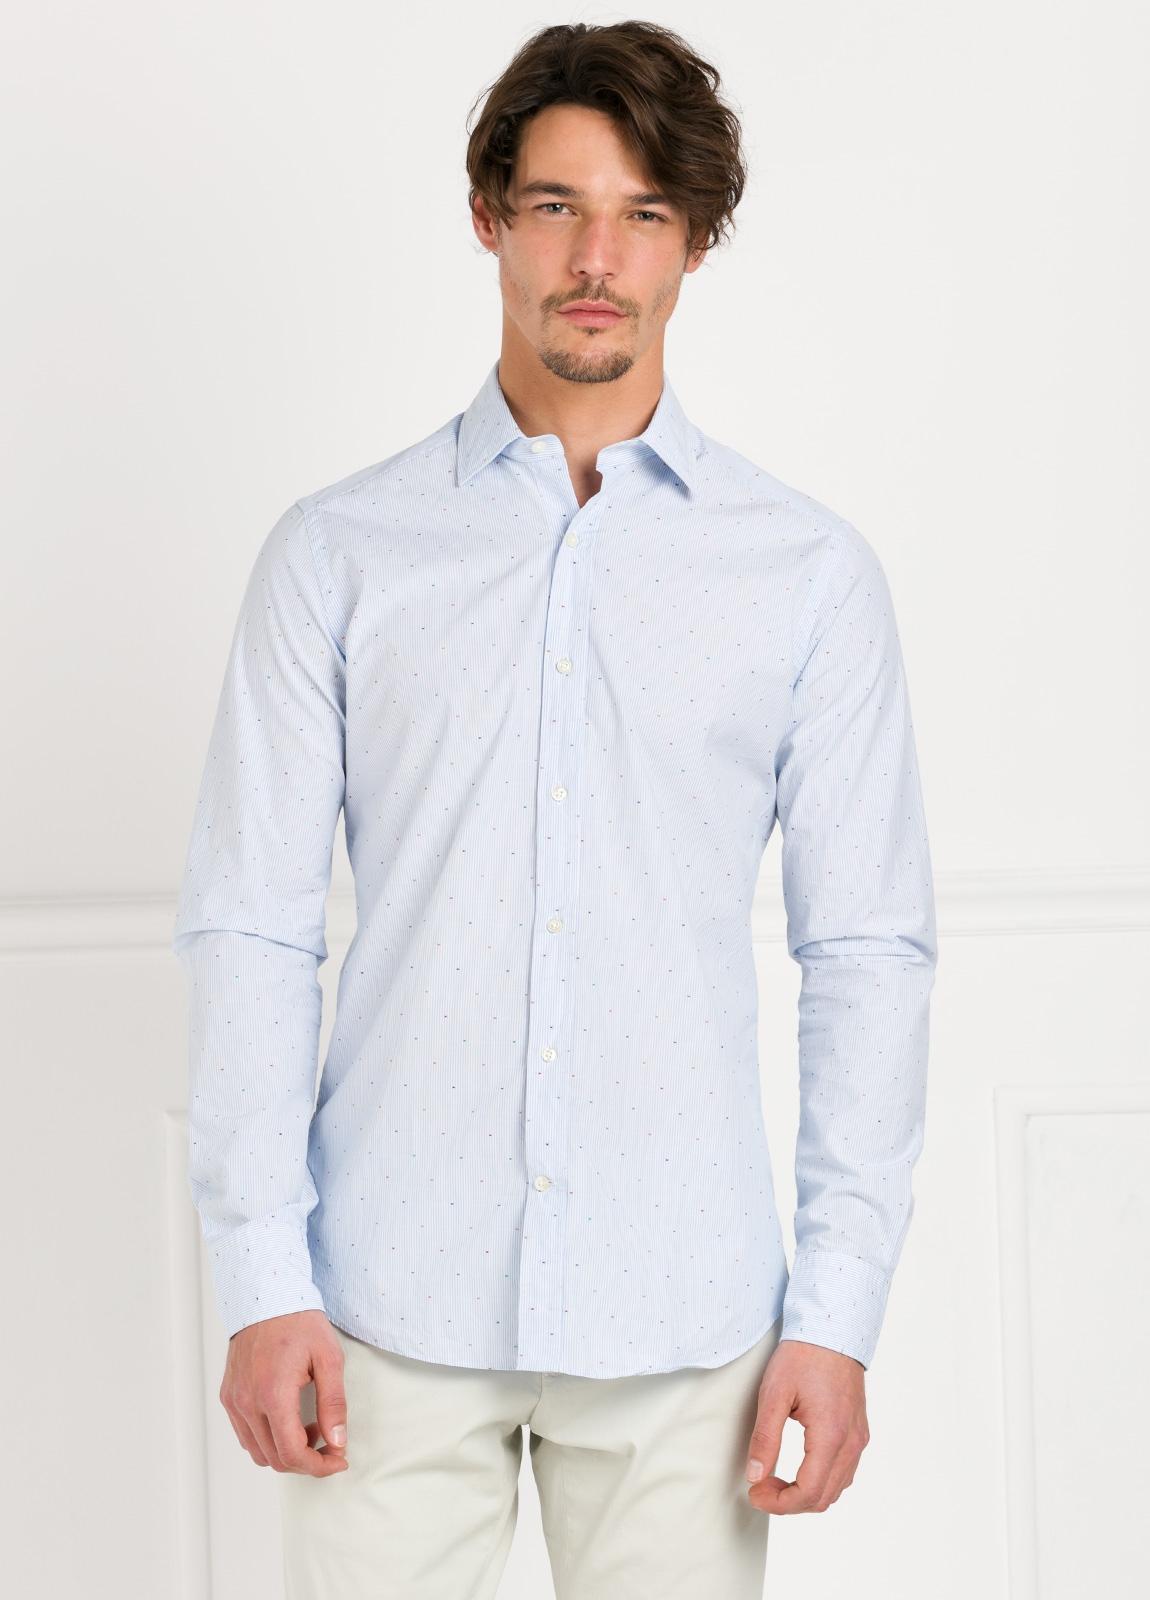 Camisa Leisure Wear SLIM FIT modelo PORTO raya con micro dibujo color celeste. 100% Algodón.